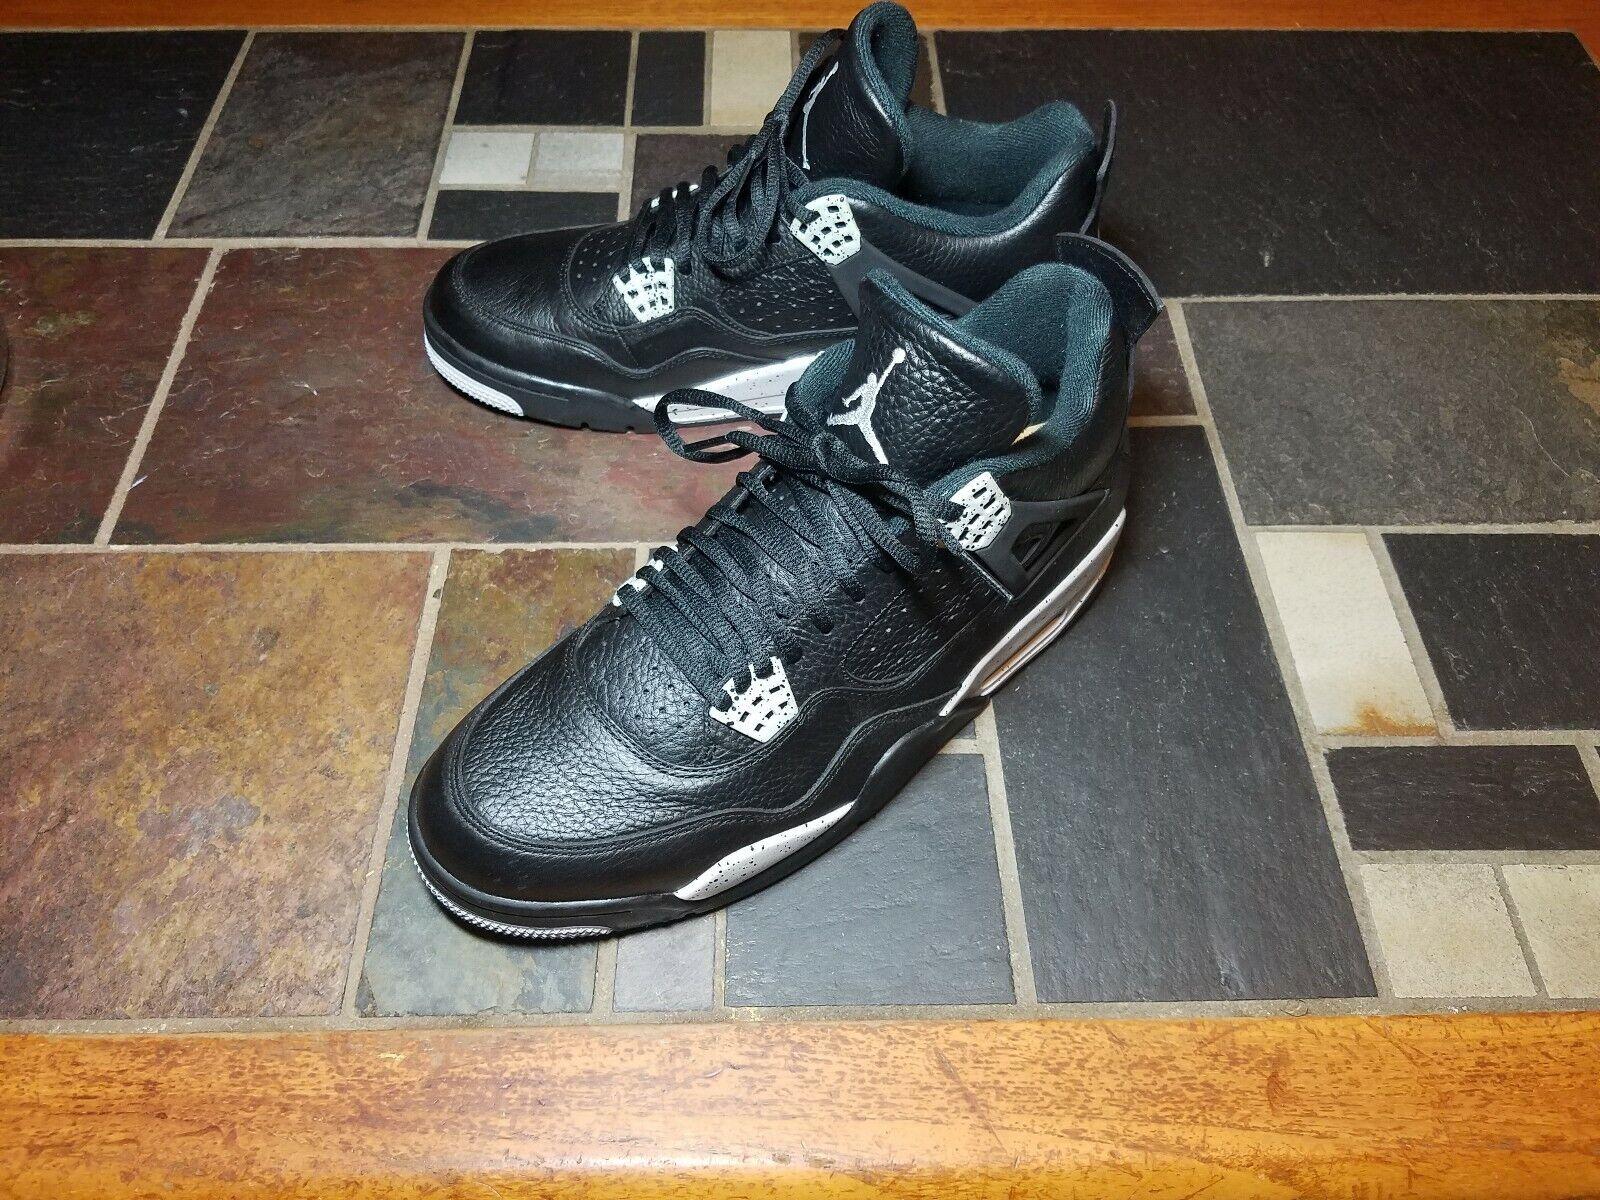 Nike Air Jordan Retro 4 Oreo, 2014 Release, US 11